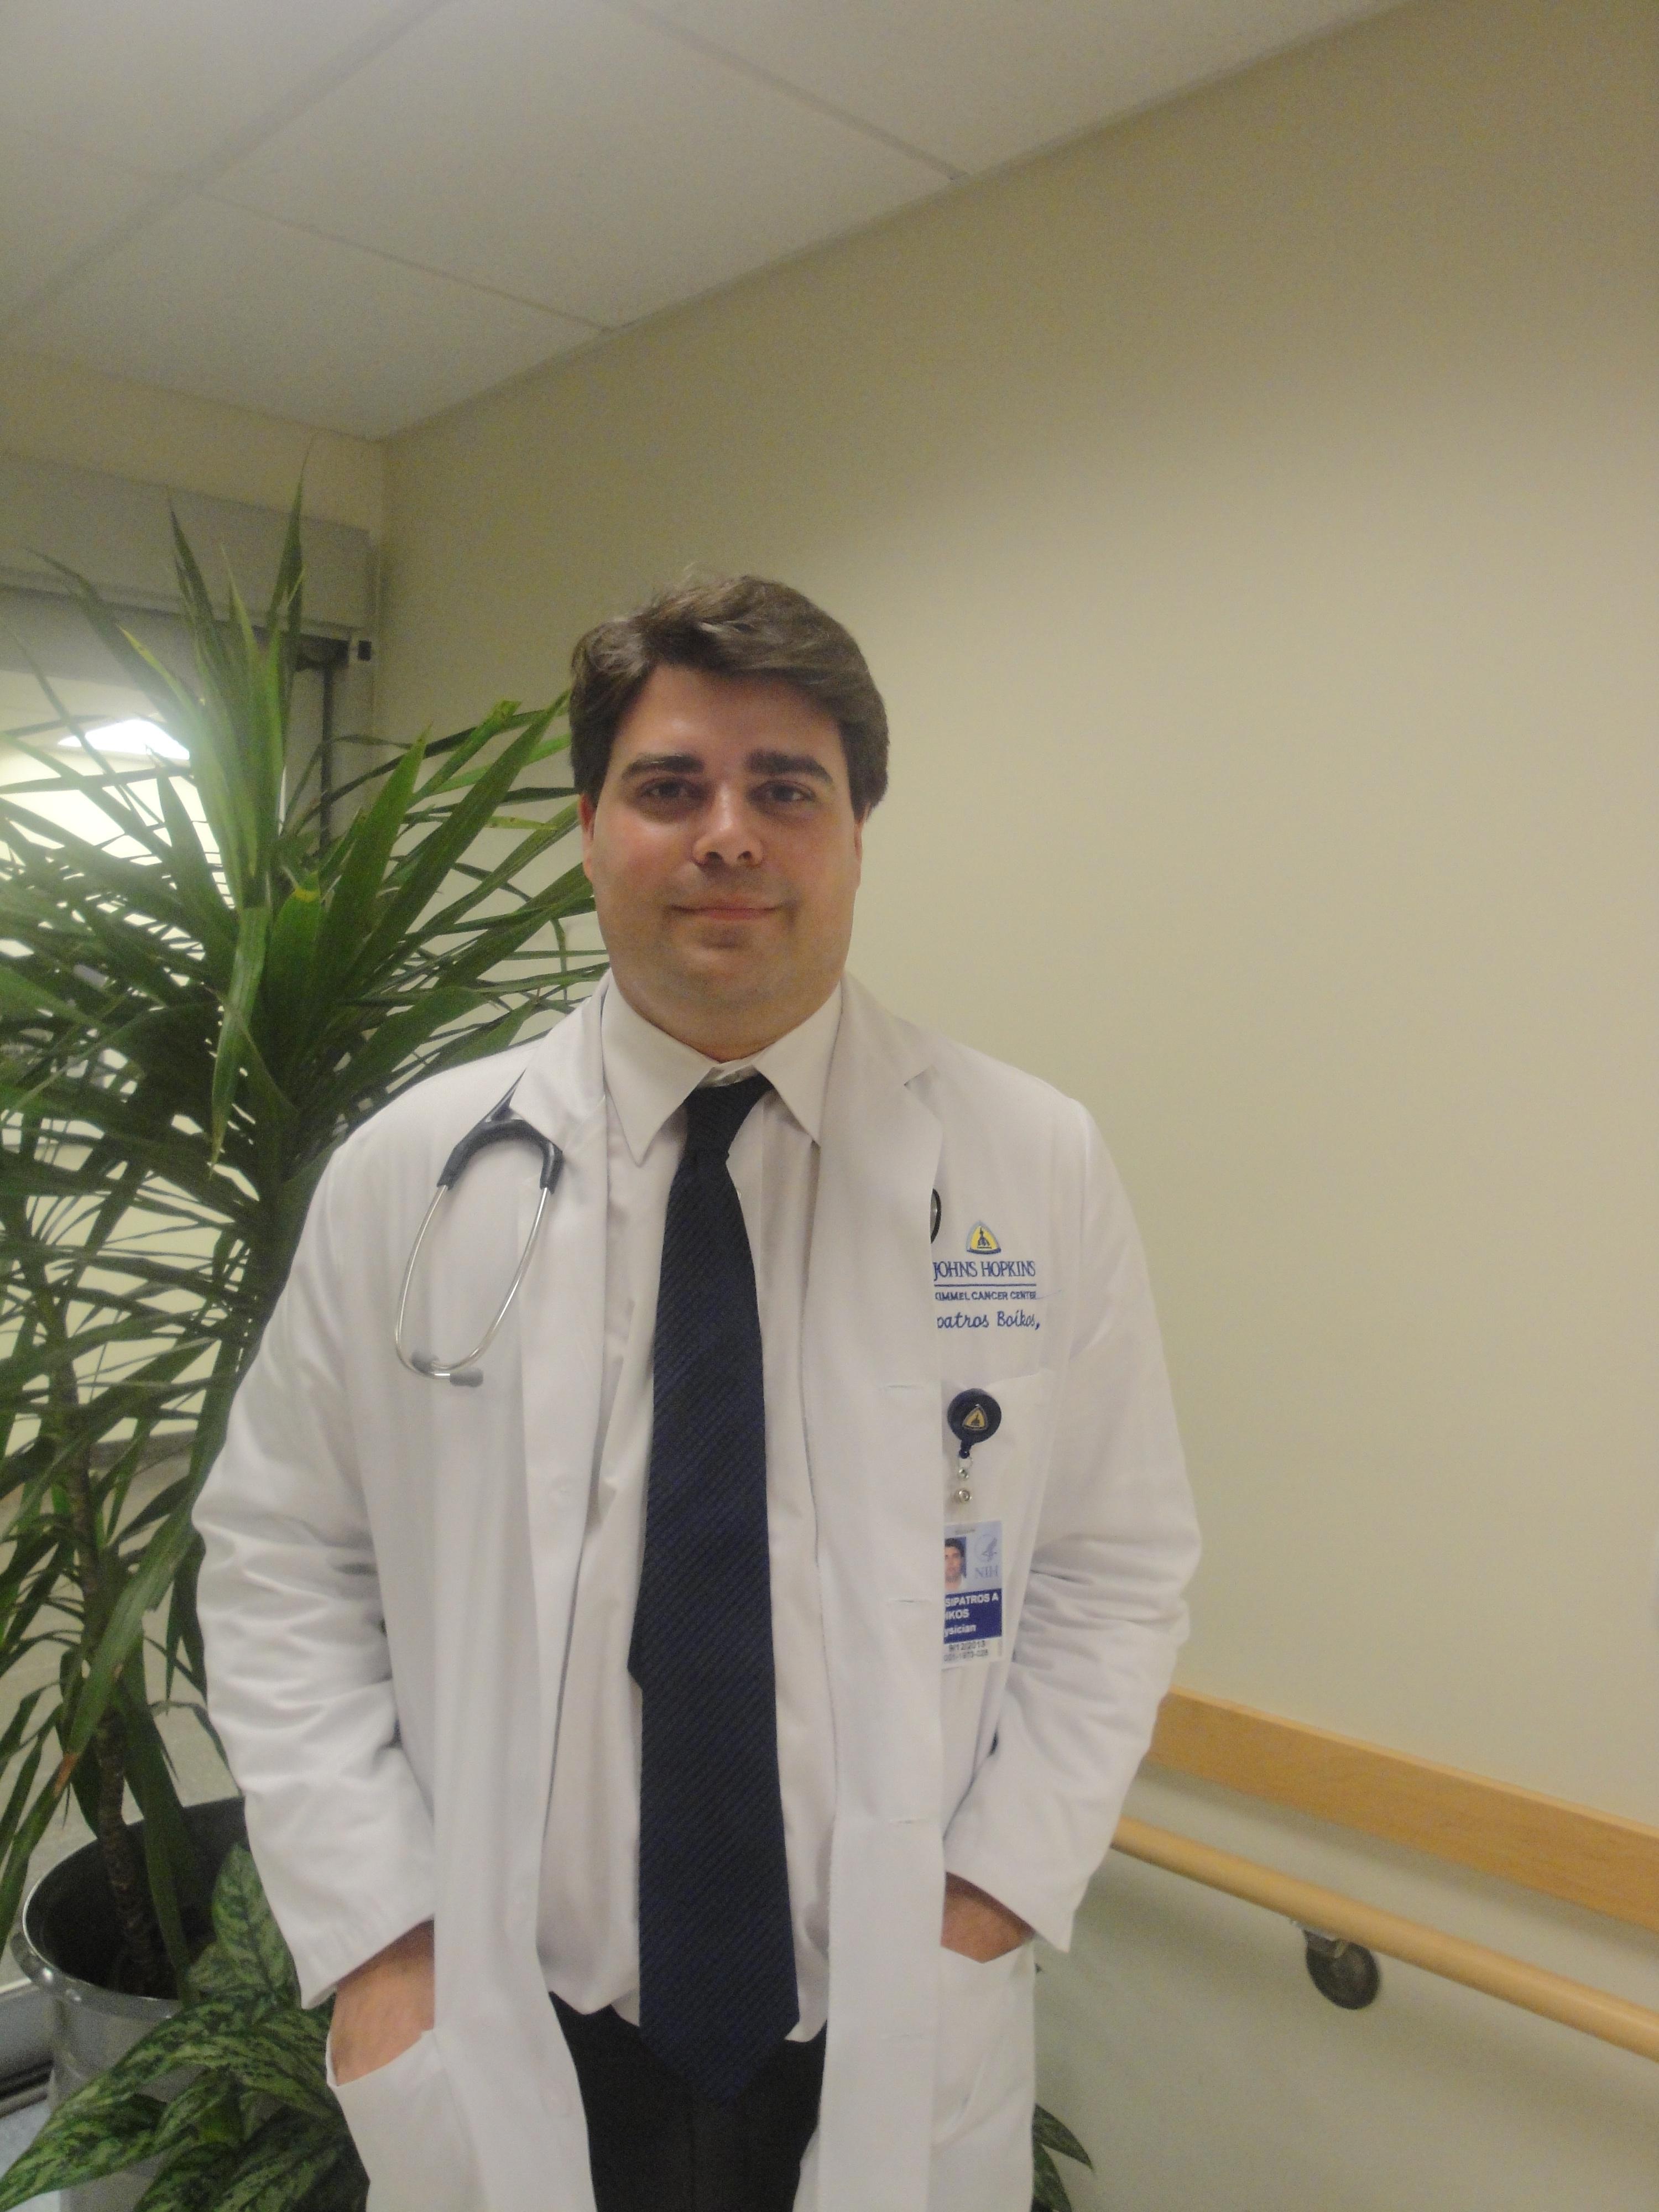 Dr. Boikos